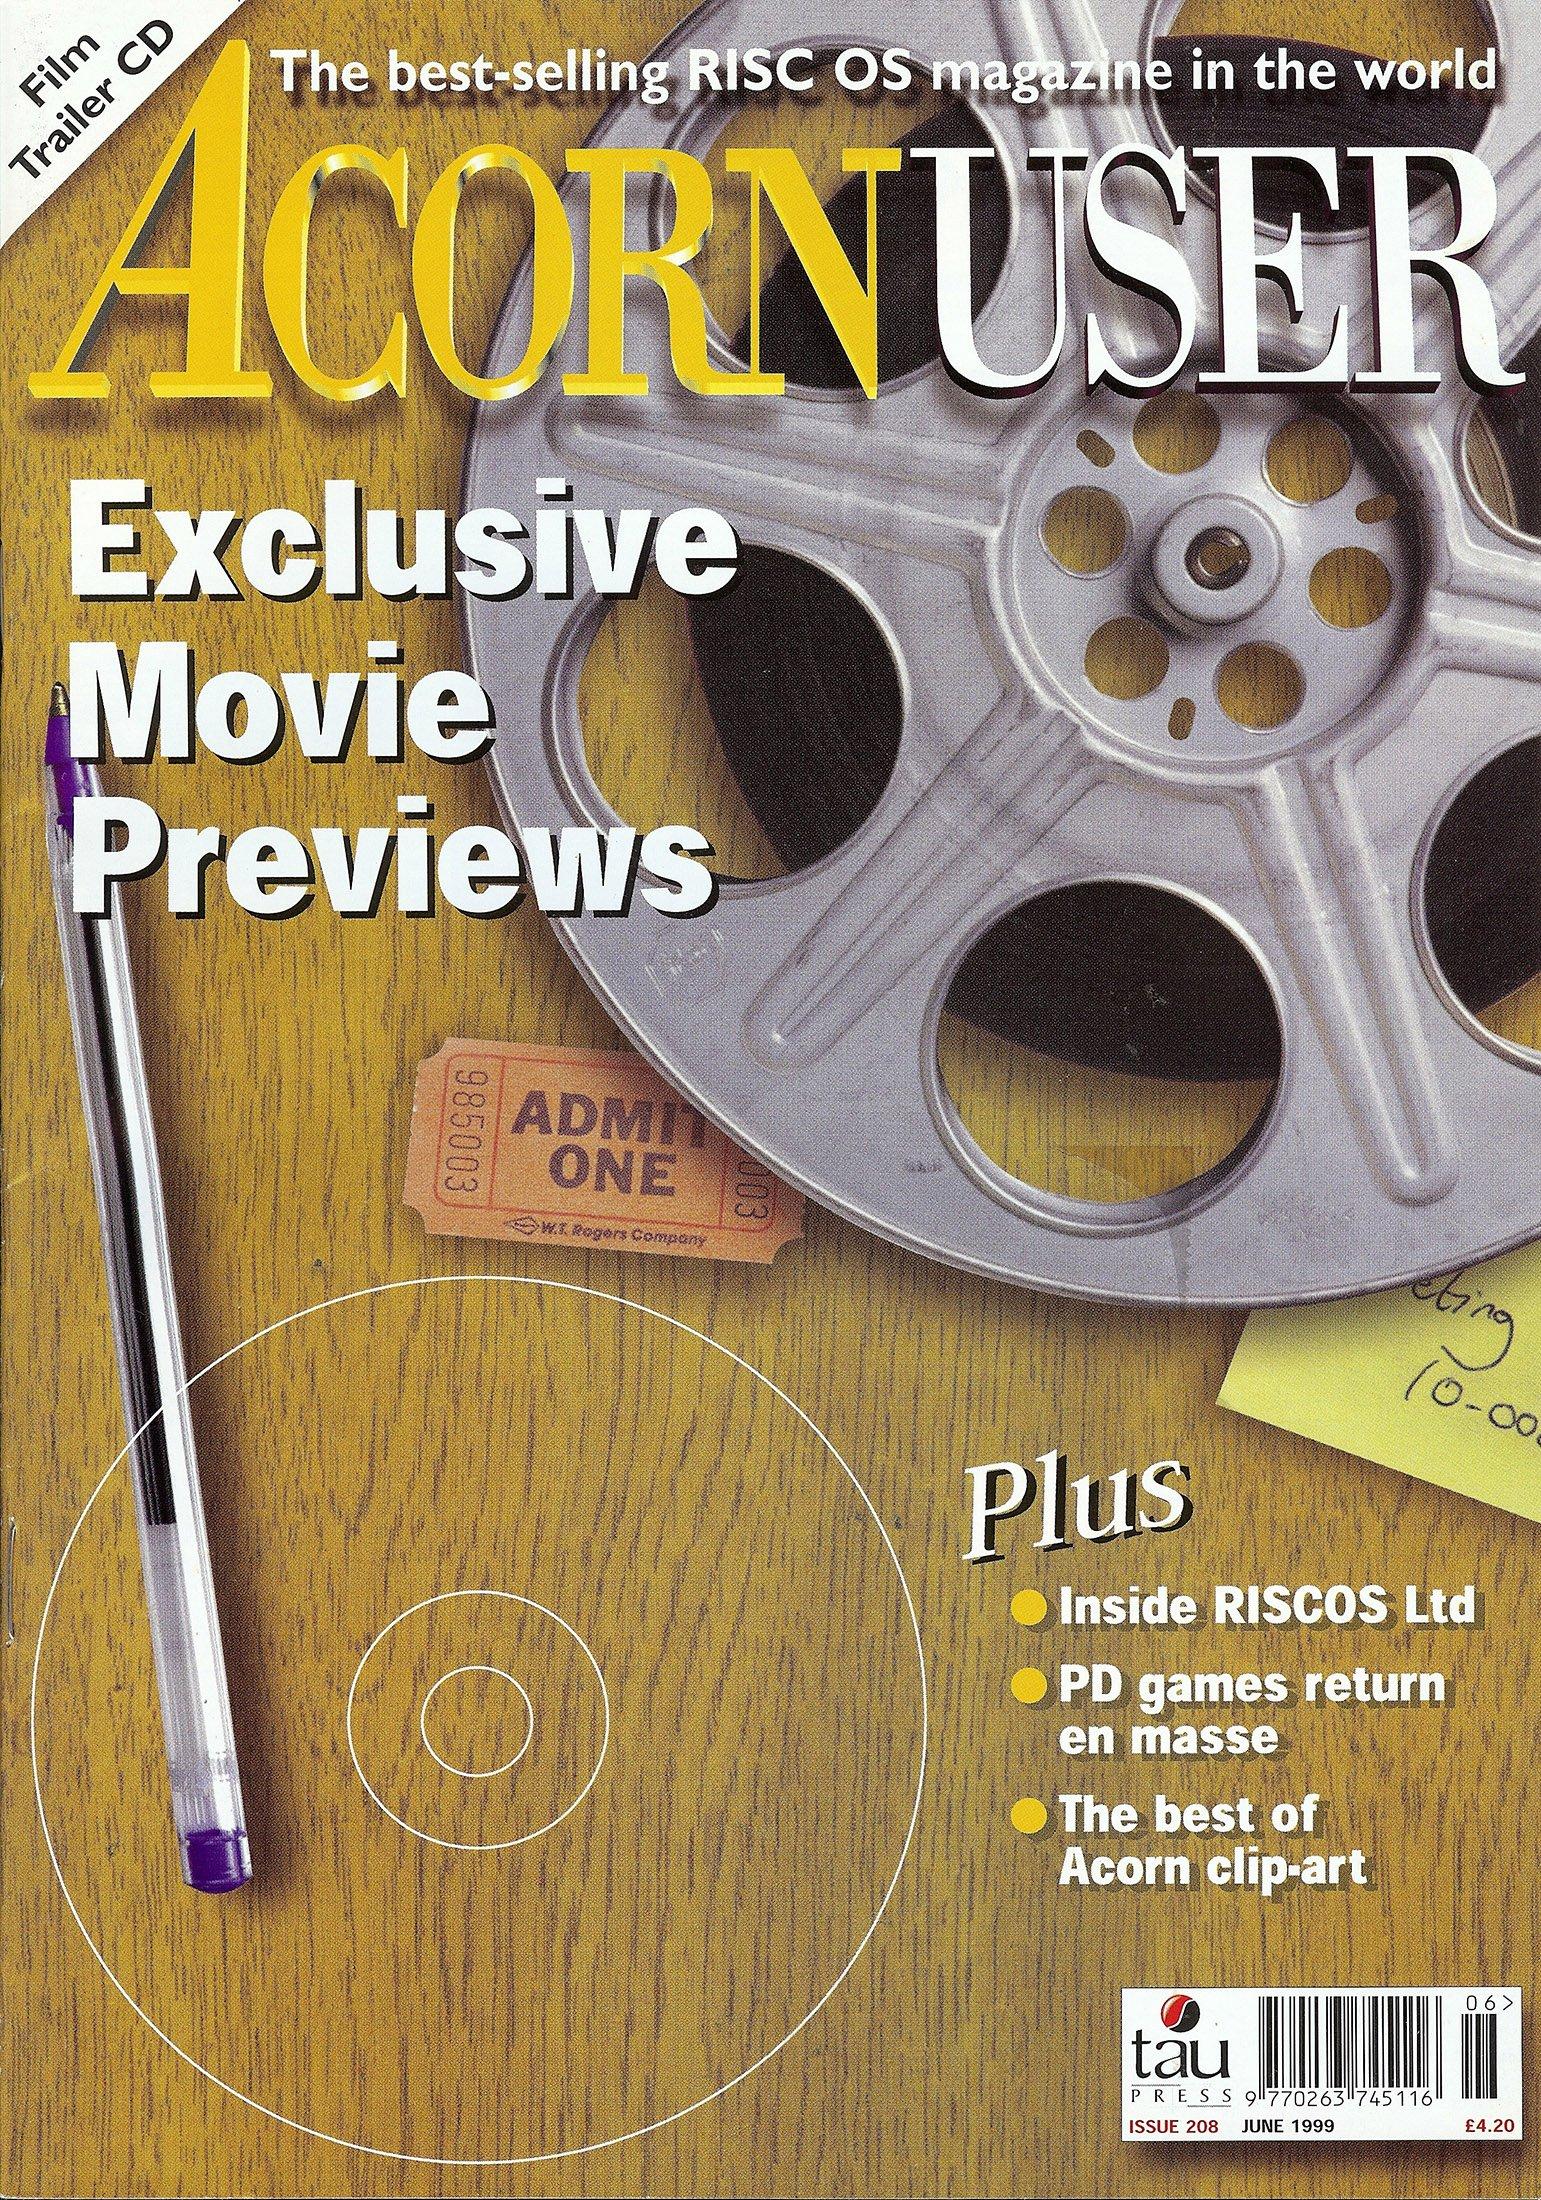 Acorn User 208 (June 1999)